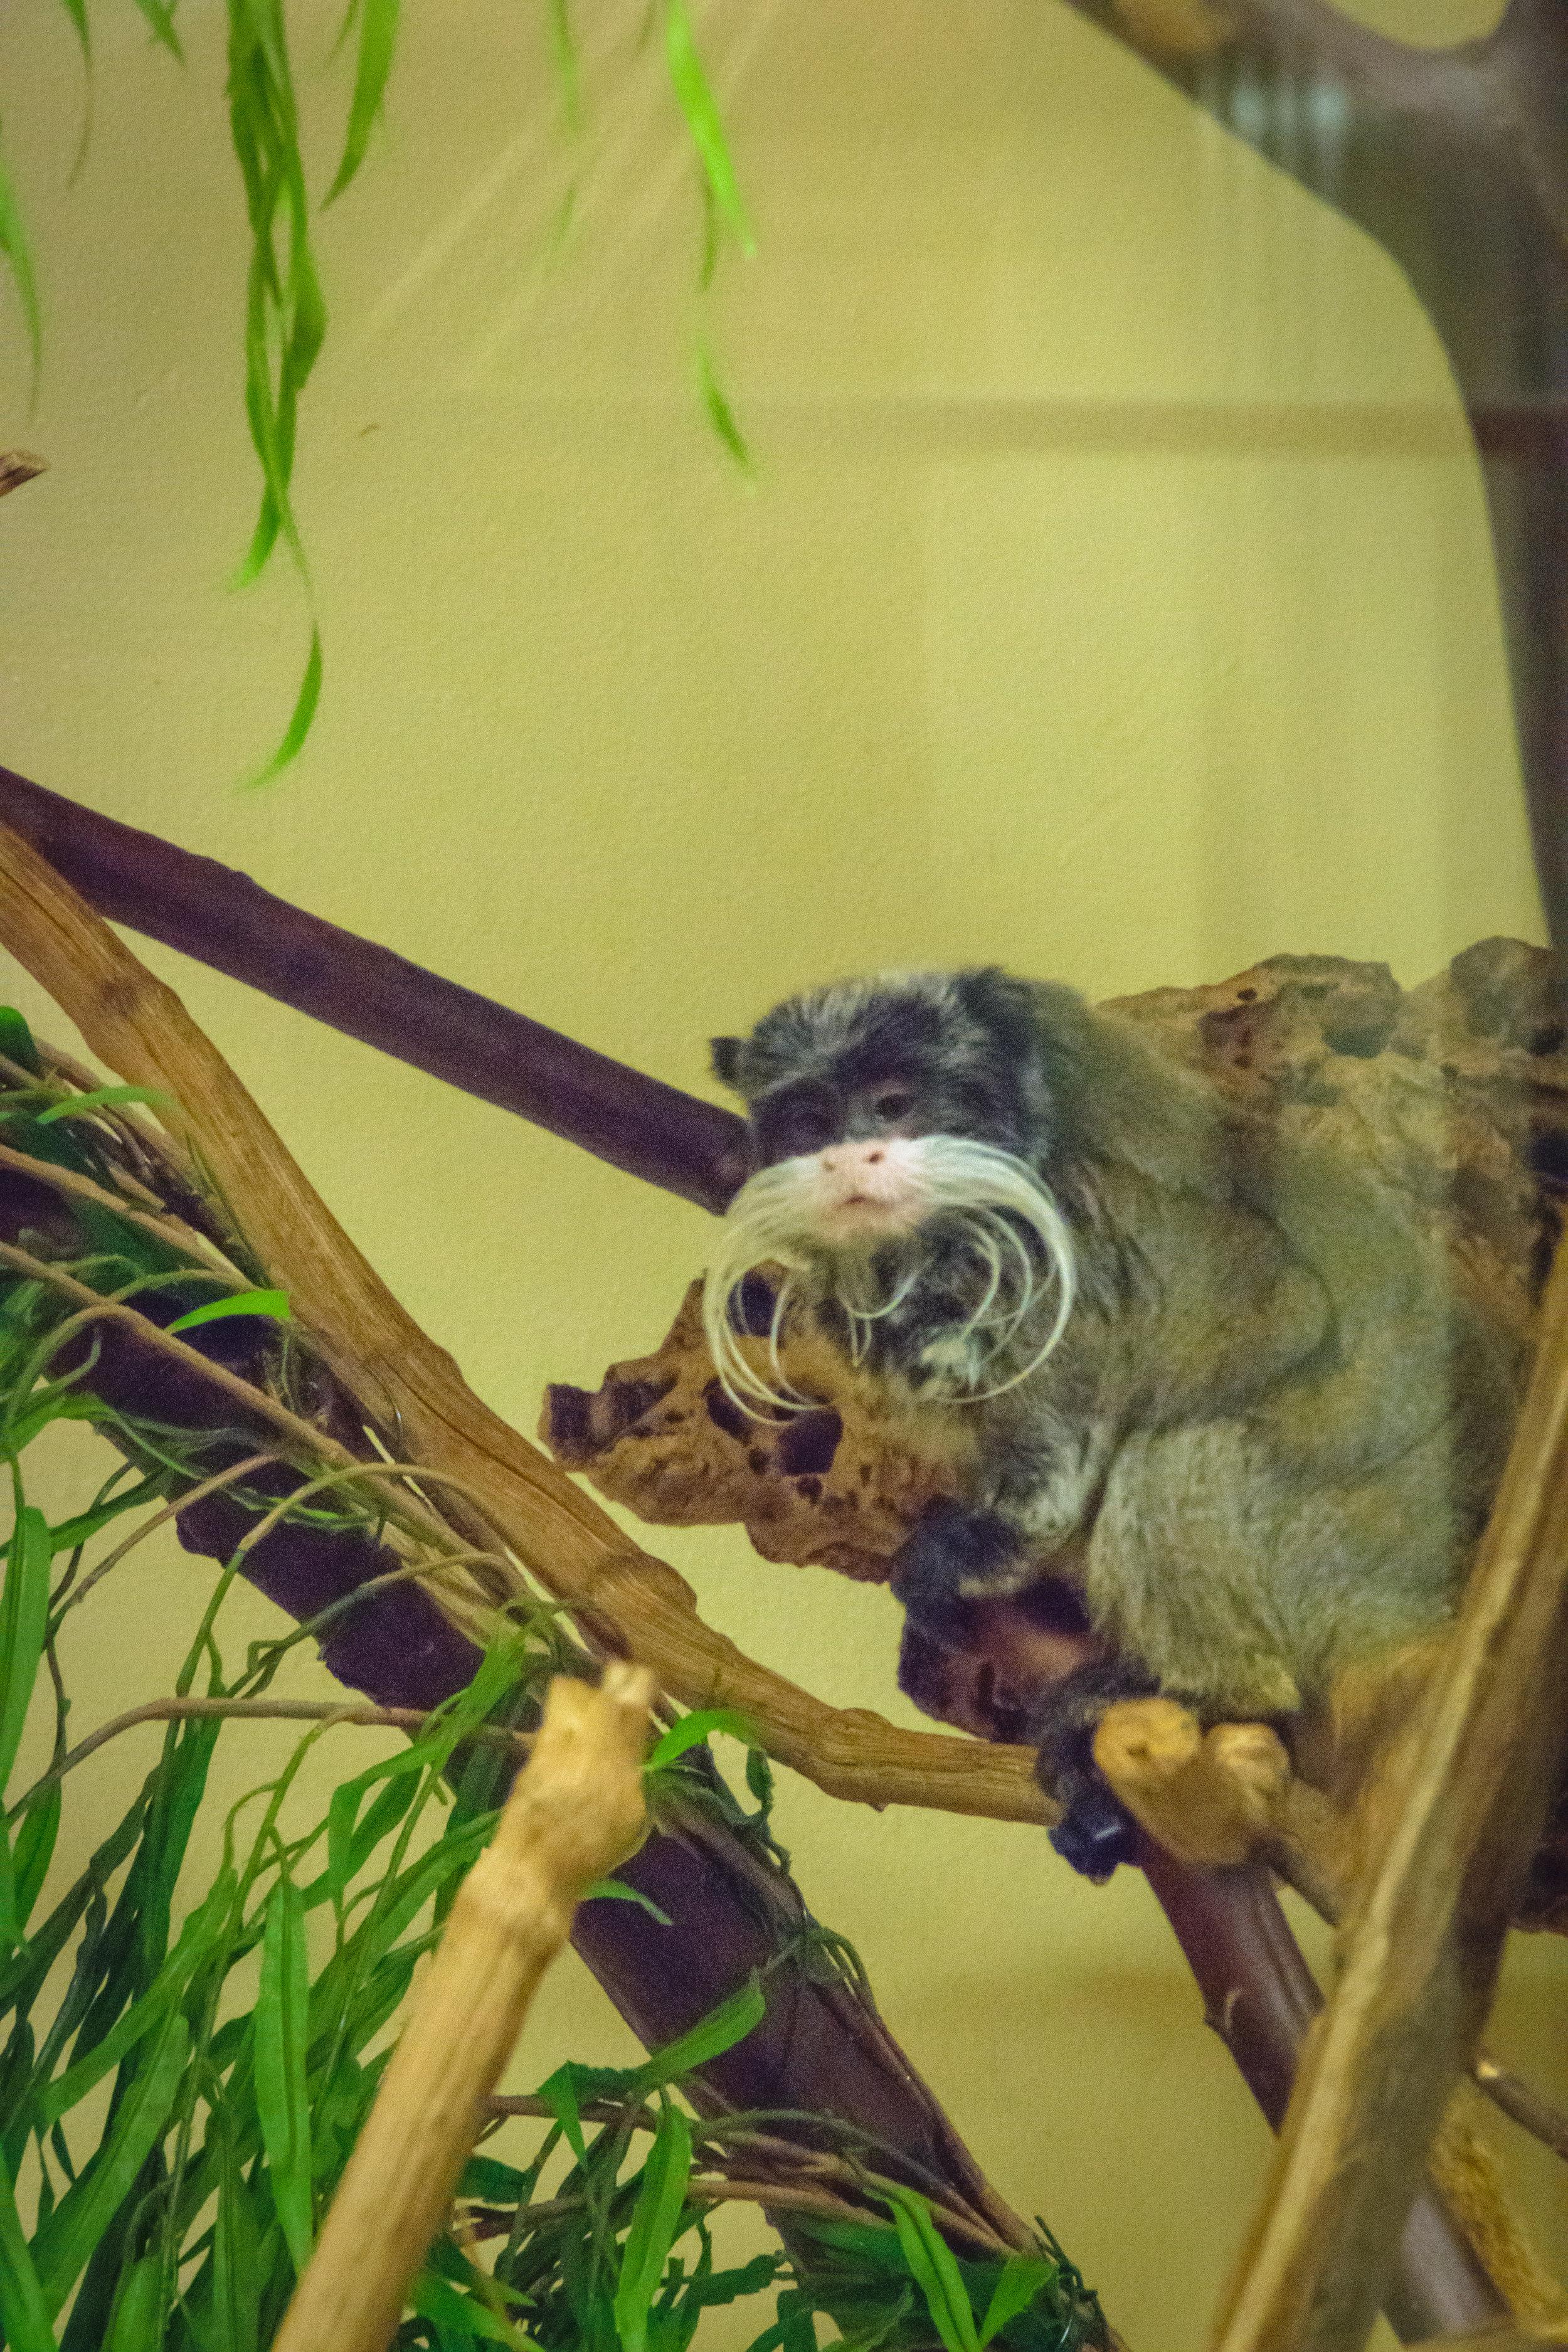 a mustachioed yet sad chimp